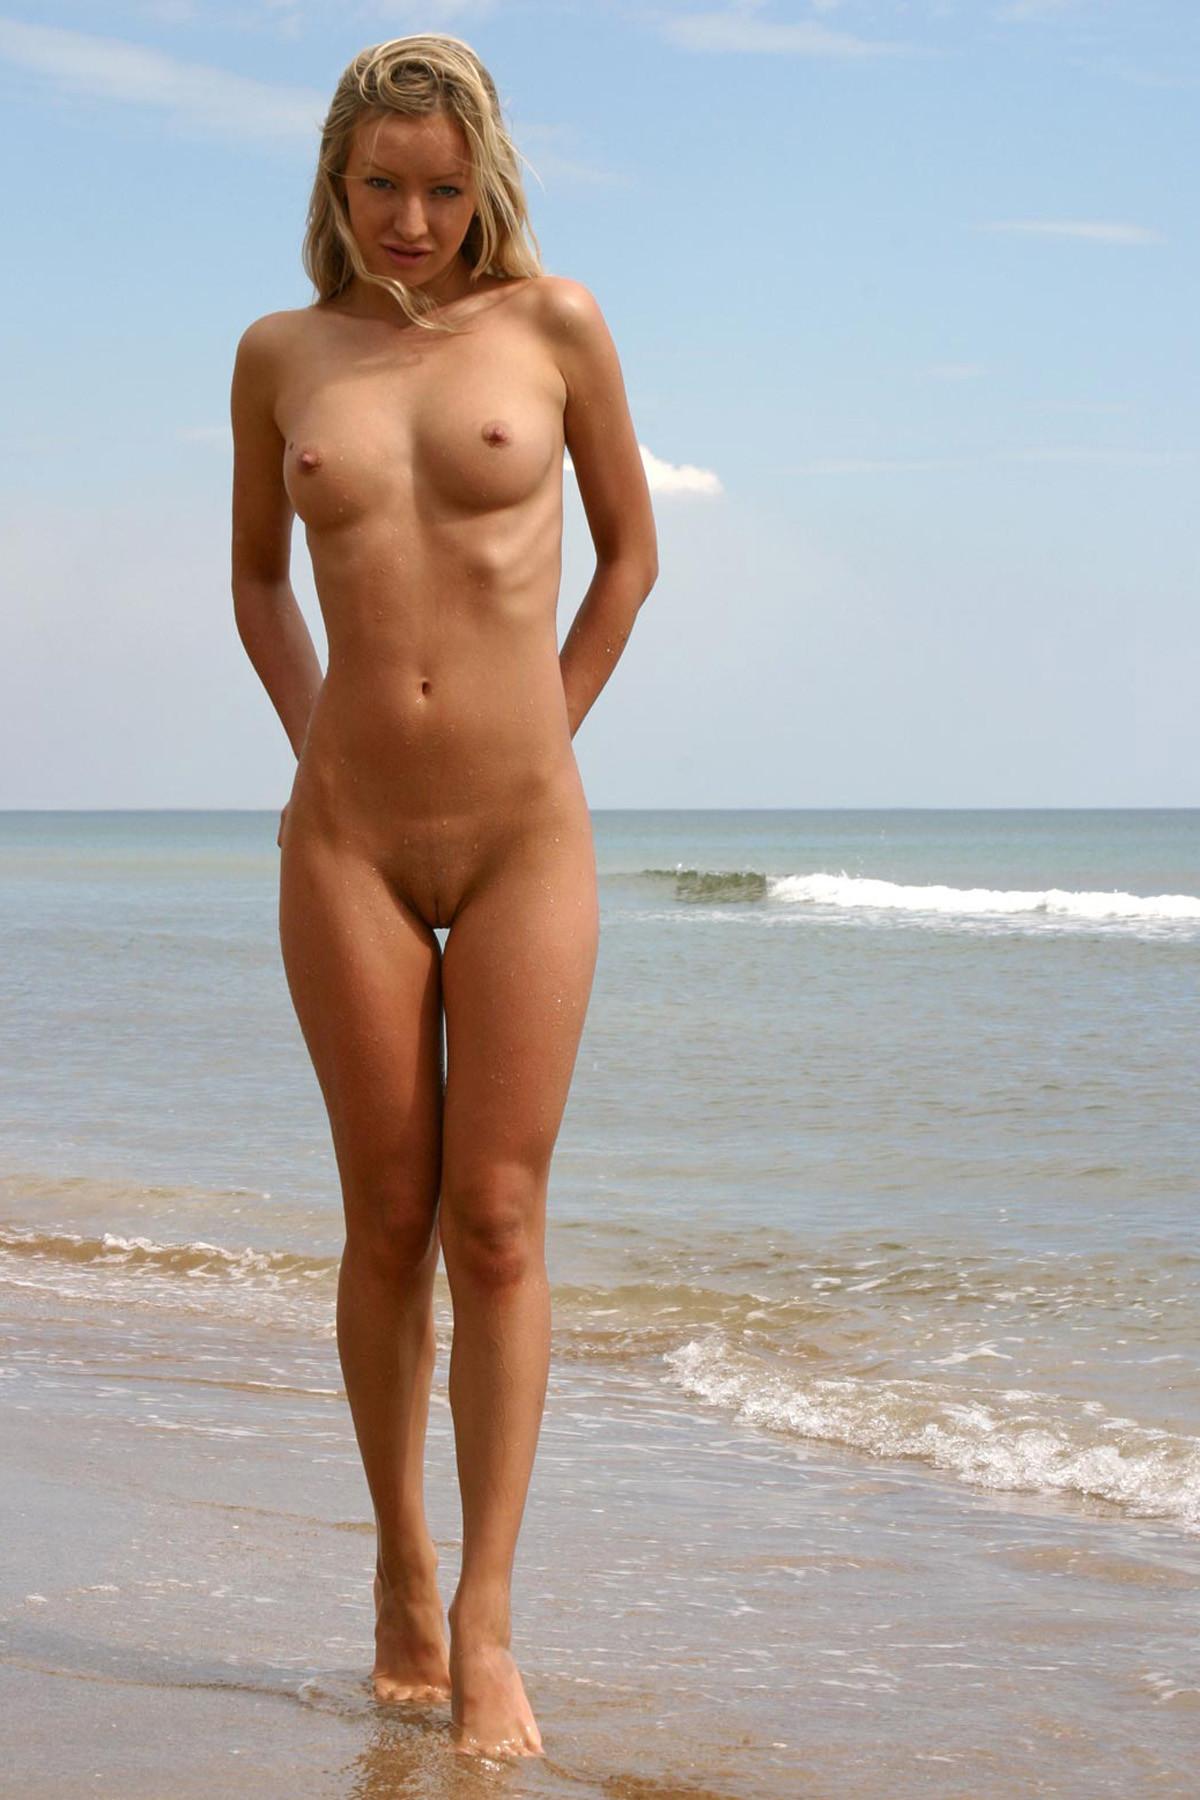 Naked blond babe seems shy